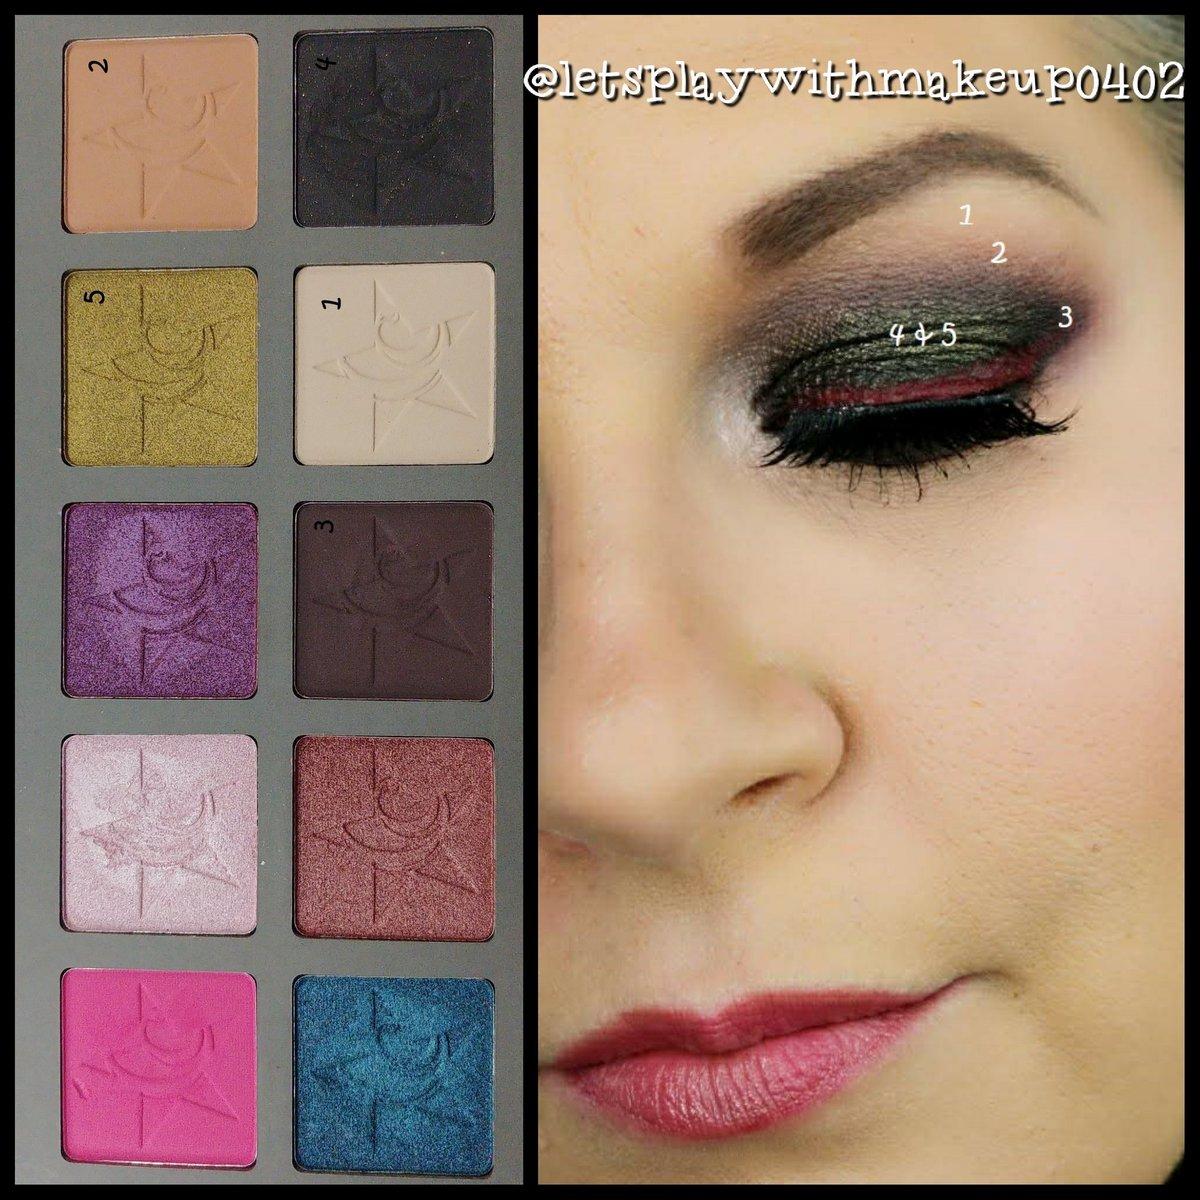 MOTD - @ccolorcosmetics Unisex 2 Palette #pictorial #makeuppictorial #motd #fotd #eotd #makeupaddict #beauty #makeup #mommymakeup #instaglam #instamakeup #eyeshadowlooks #eyelooks #ilovemakeup #mua #makeupjunkie #makeuplook #makeuplove #makeupartist #canadiangirl #canadianmua